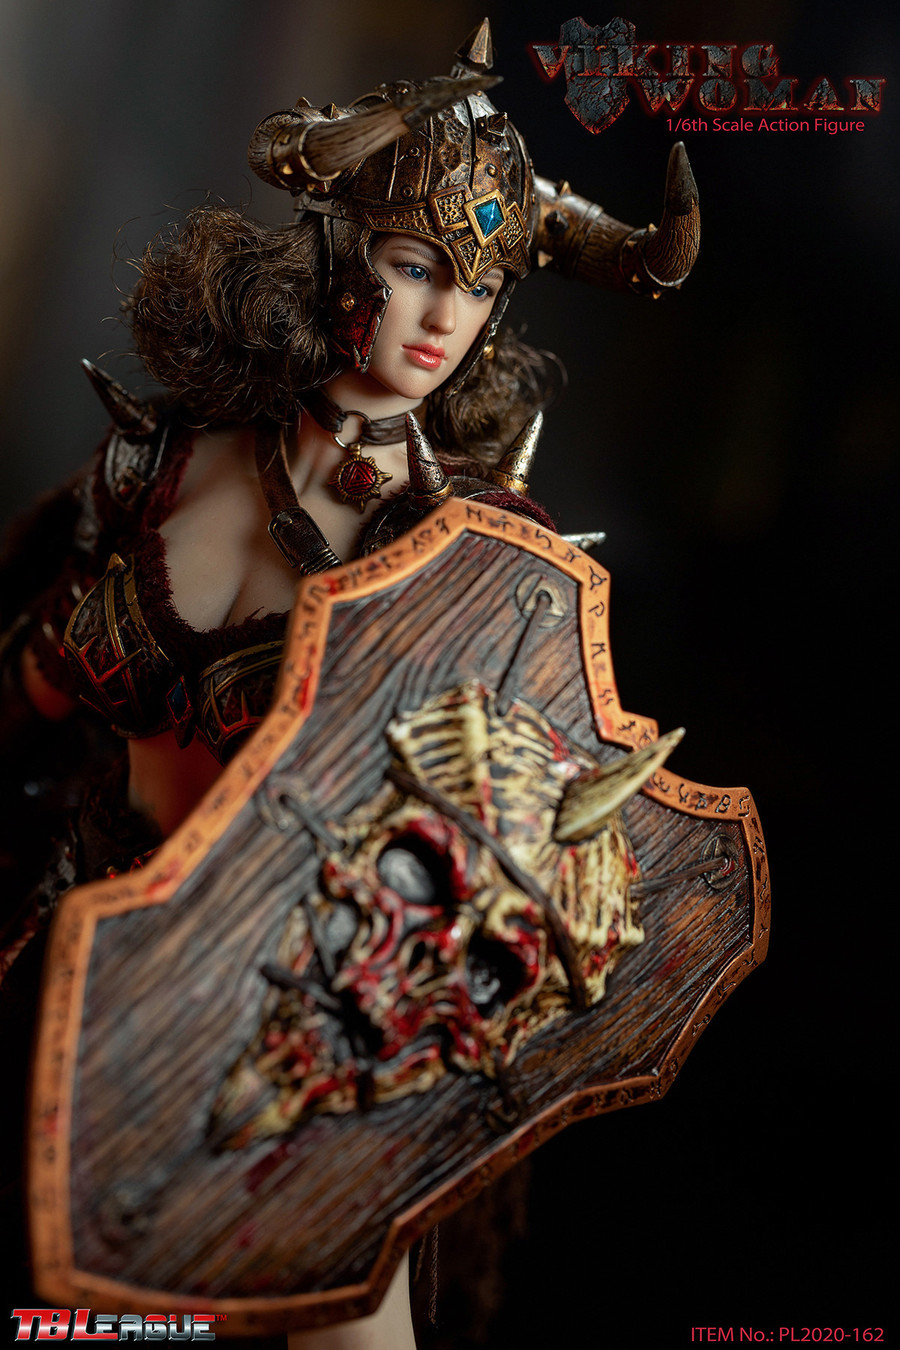 TBLeague - Viking Woman